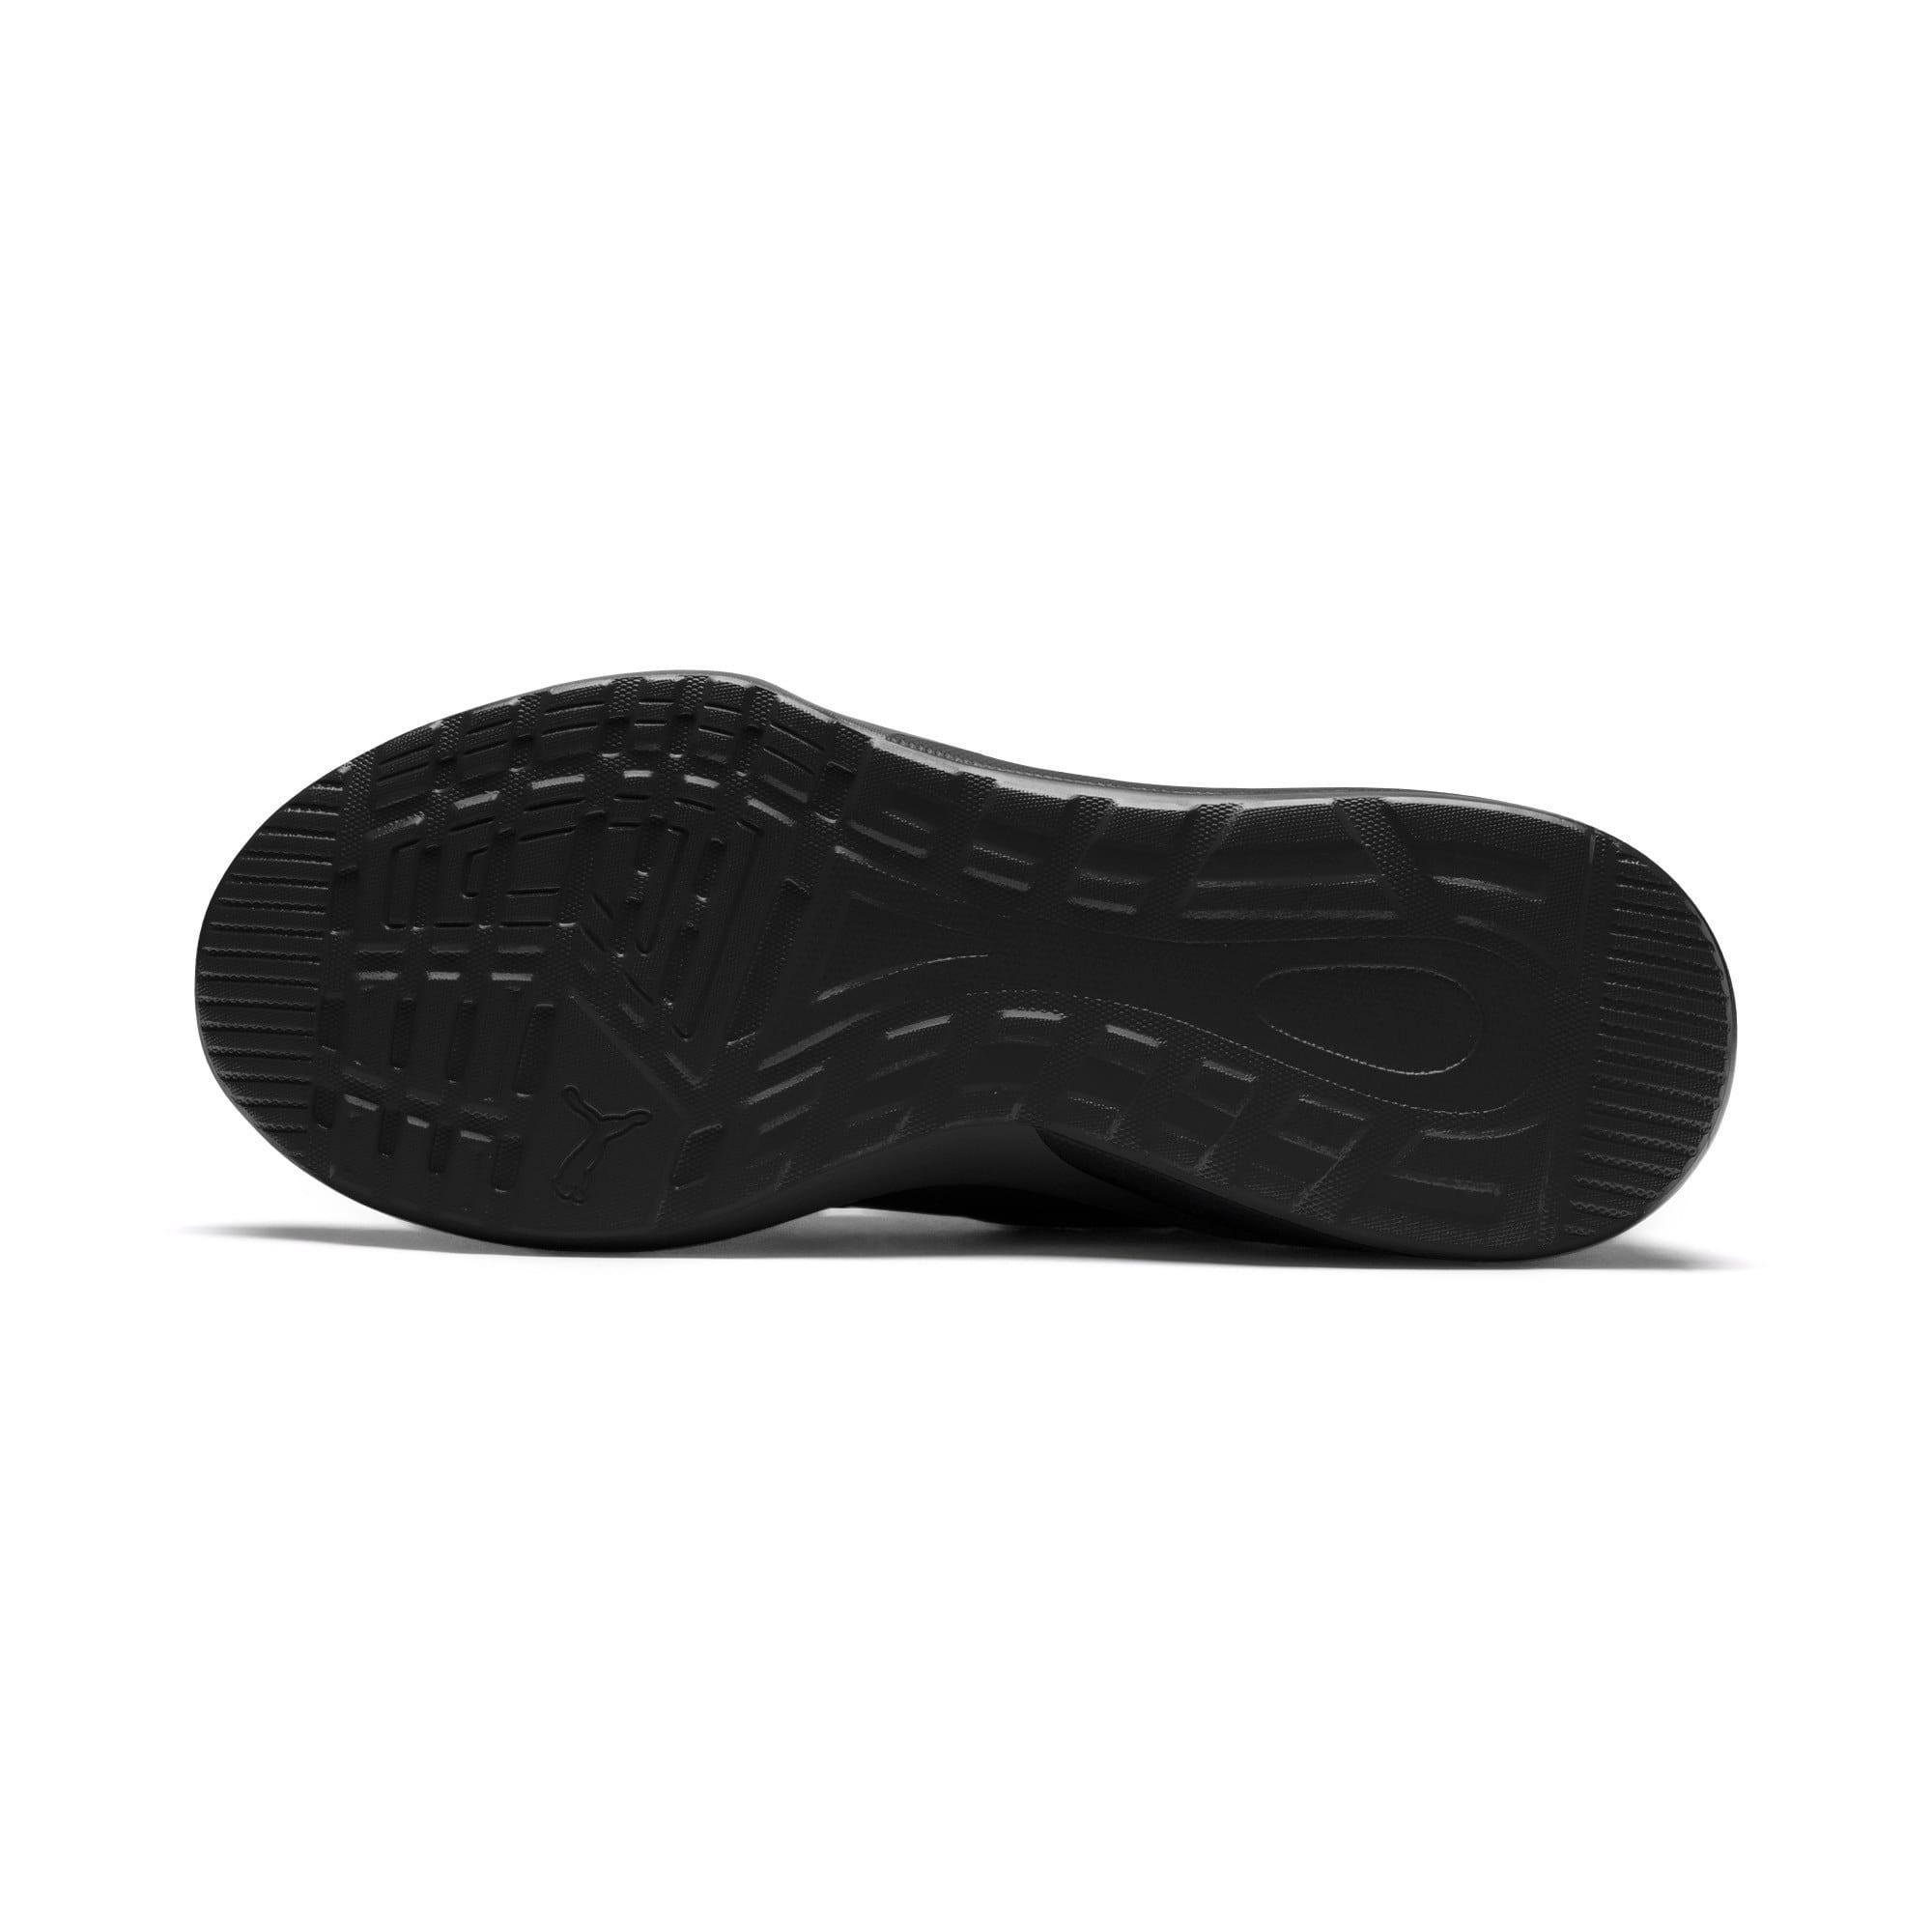 Thumbnail 4 of Emergence Men's Running Shoes, High Risk Red-Puma Black, medium-IND